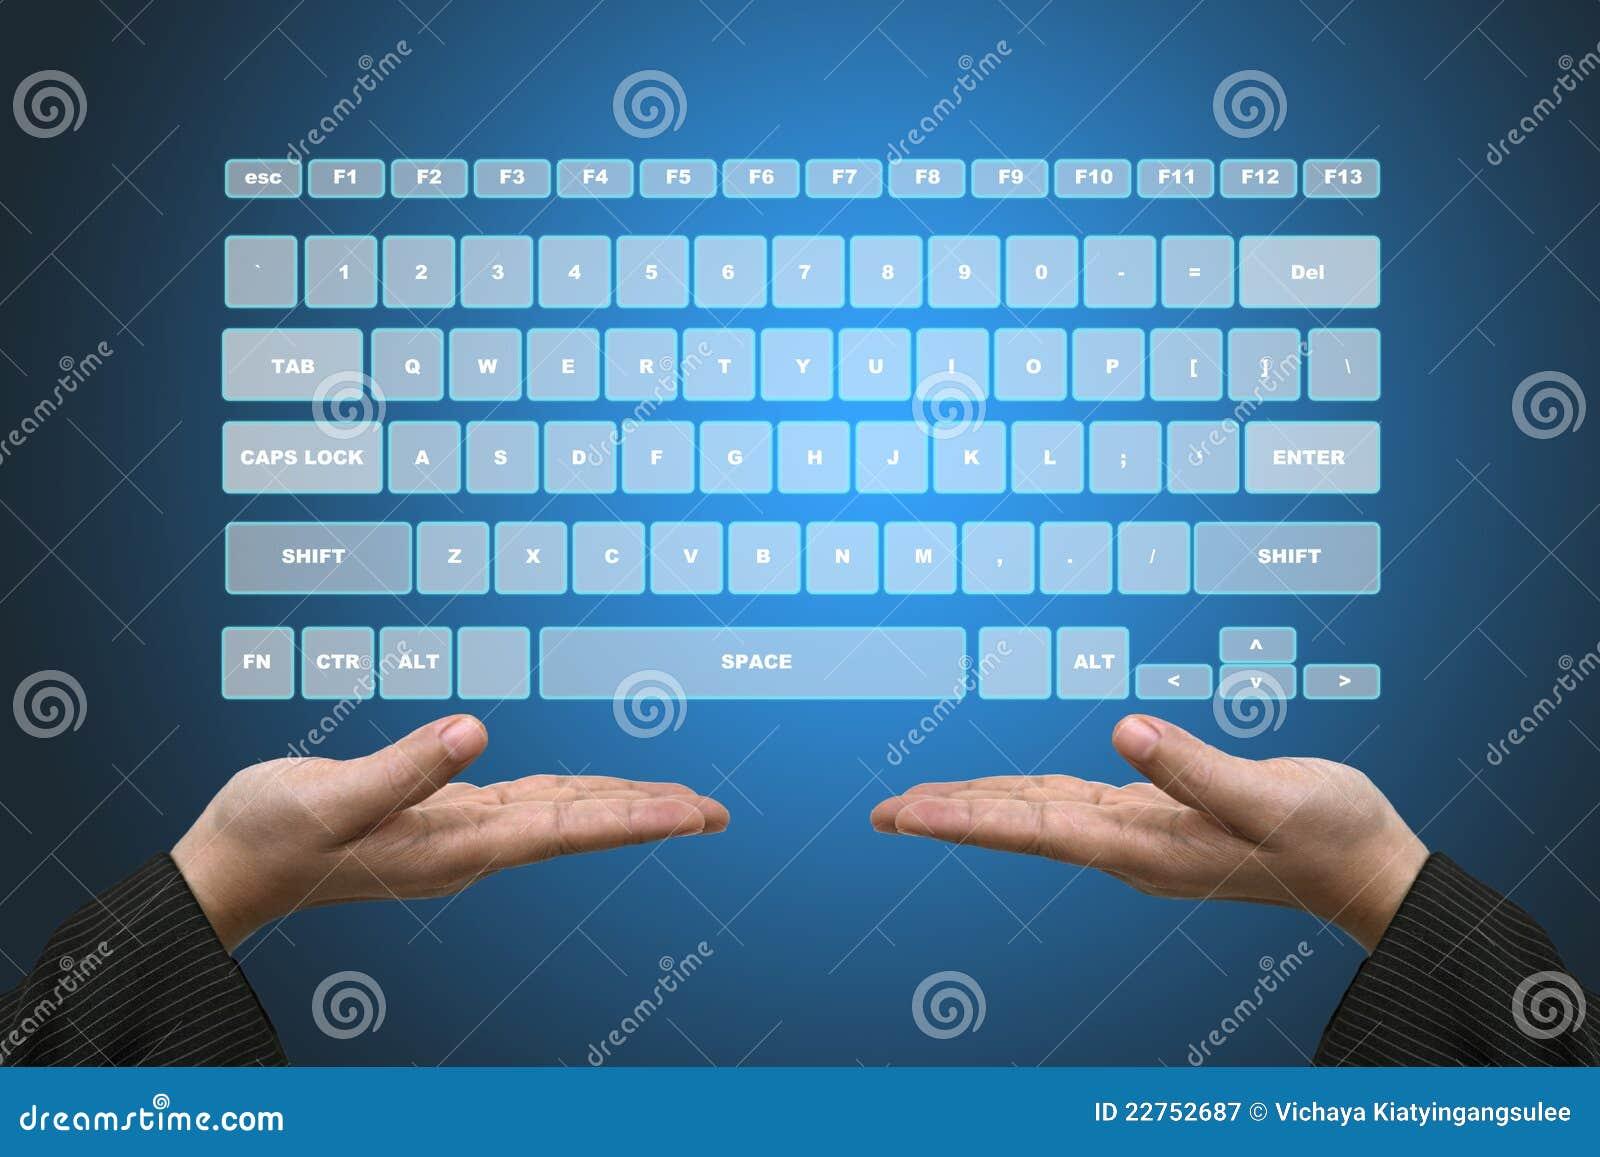 Virtual Keyboard Interface stock image  Image of innovation - 22752687